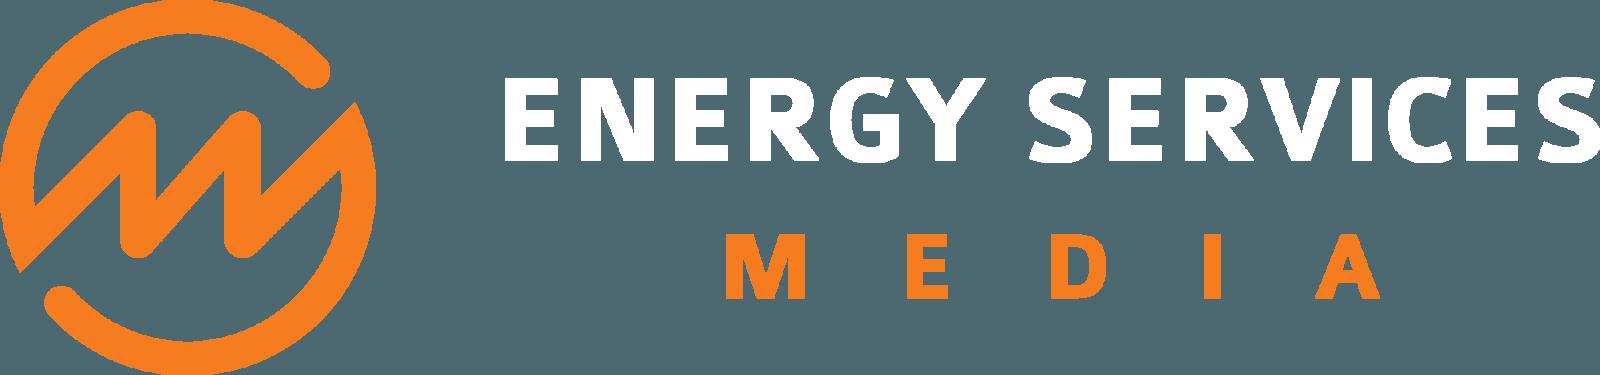 Energy Services Media